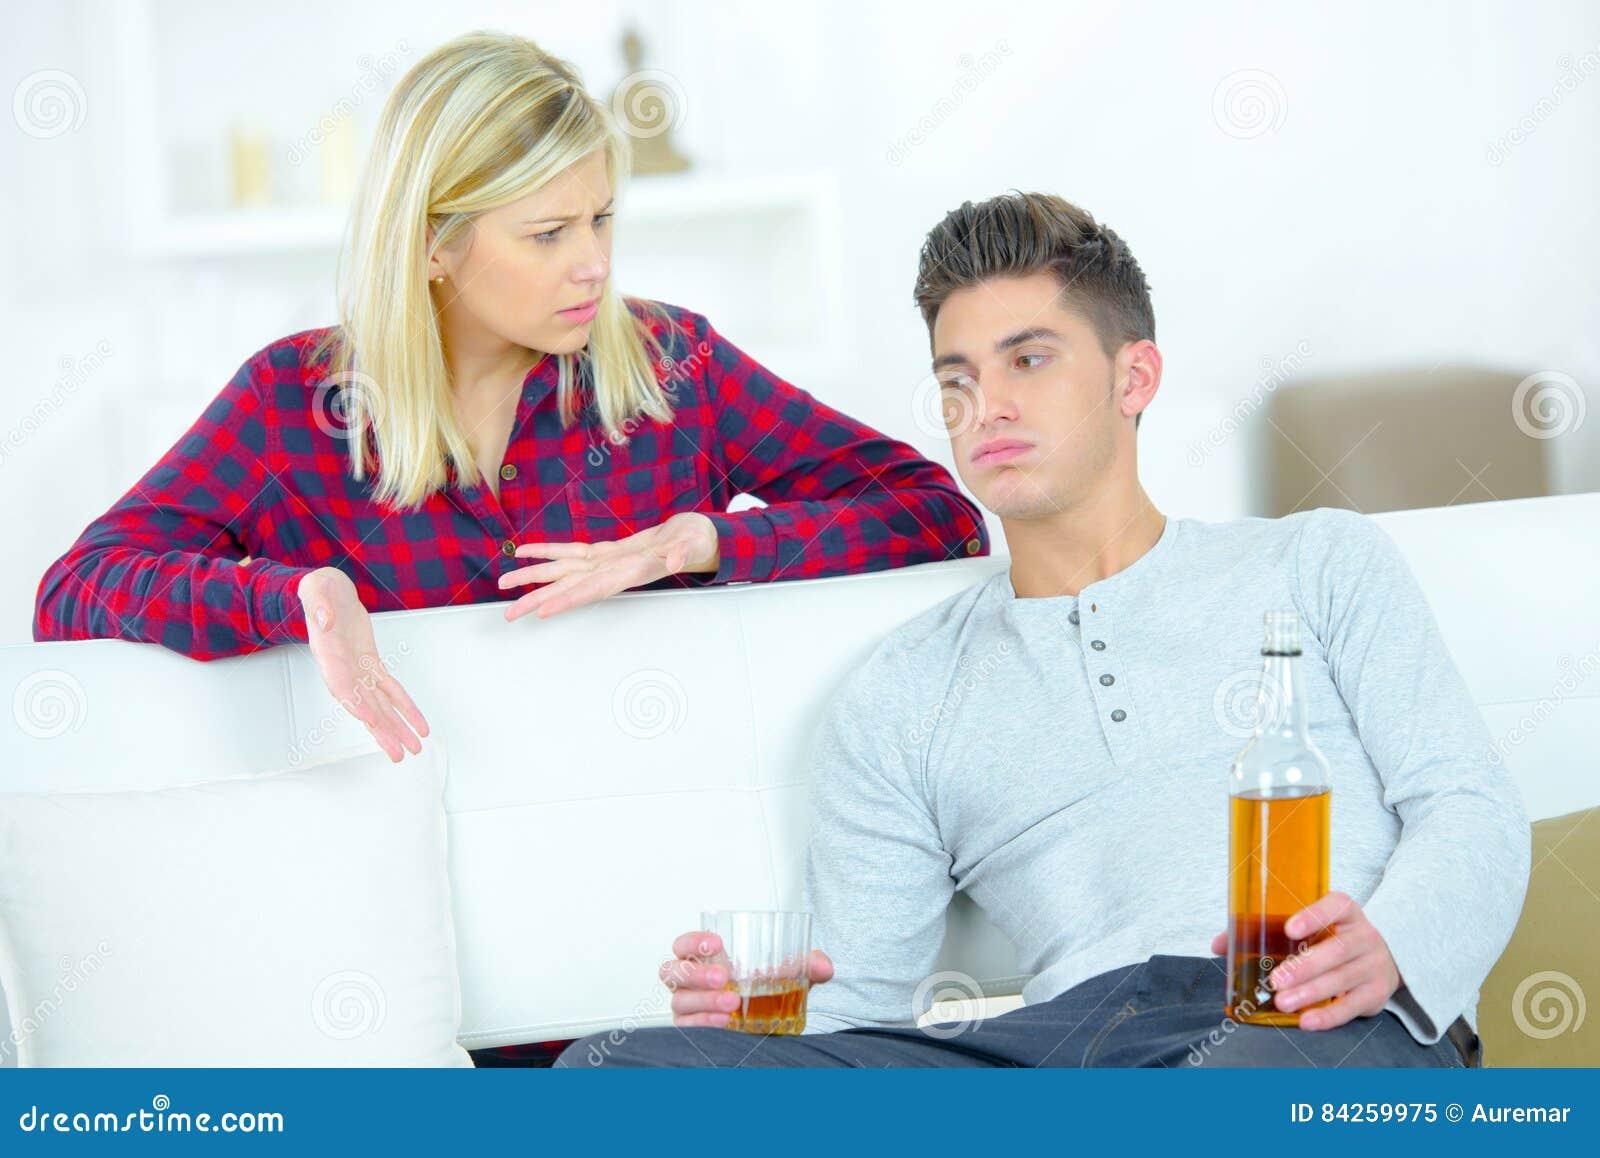 Boze vrouw die gedronken vriend